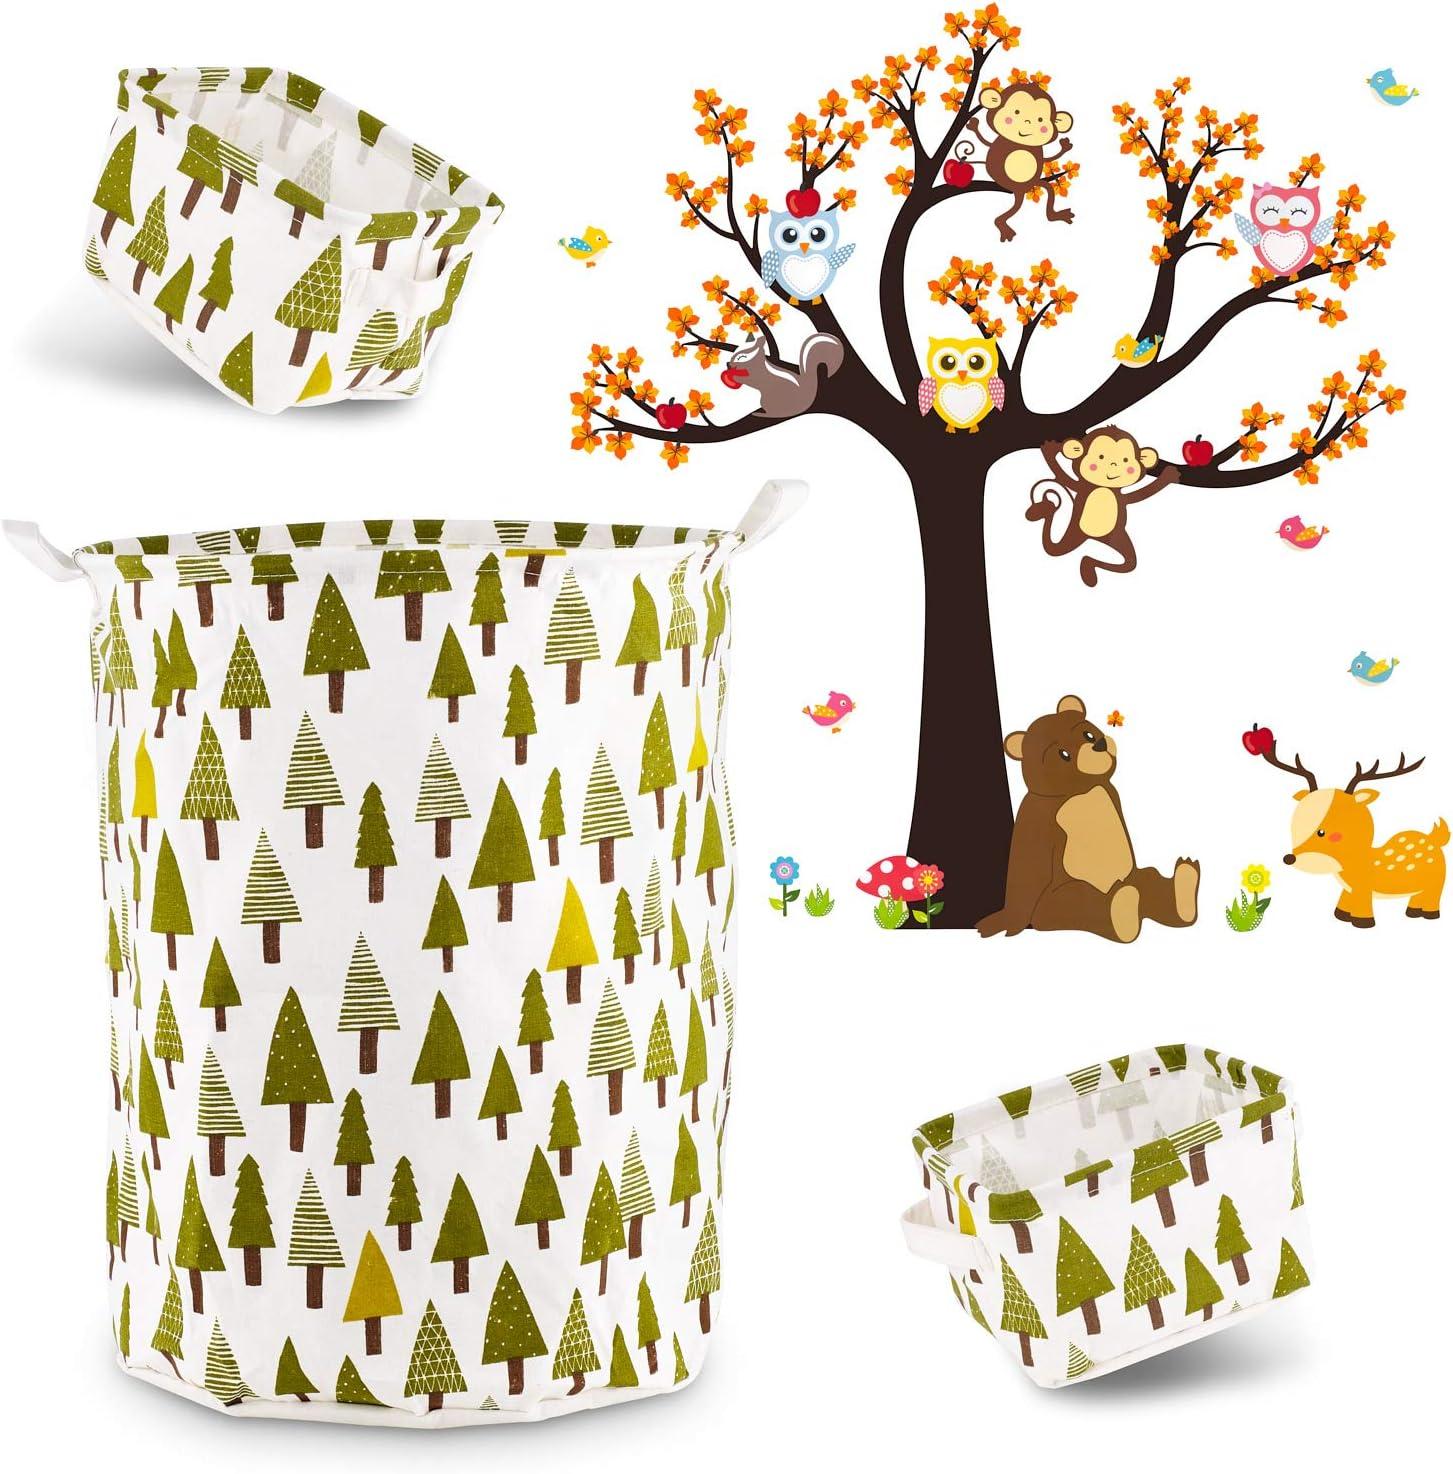 Shiny Blue Woodland Nursery Decor Set (4pce) Laundry Basket, 2 Small Storage Baskets & Forest Animal Wall Decal - Tree Print Laundry Hamper & Storage Bins - DIY Wall Decal Sticker - Woodland Decor